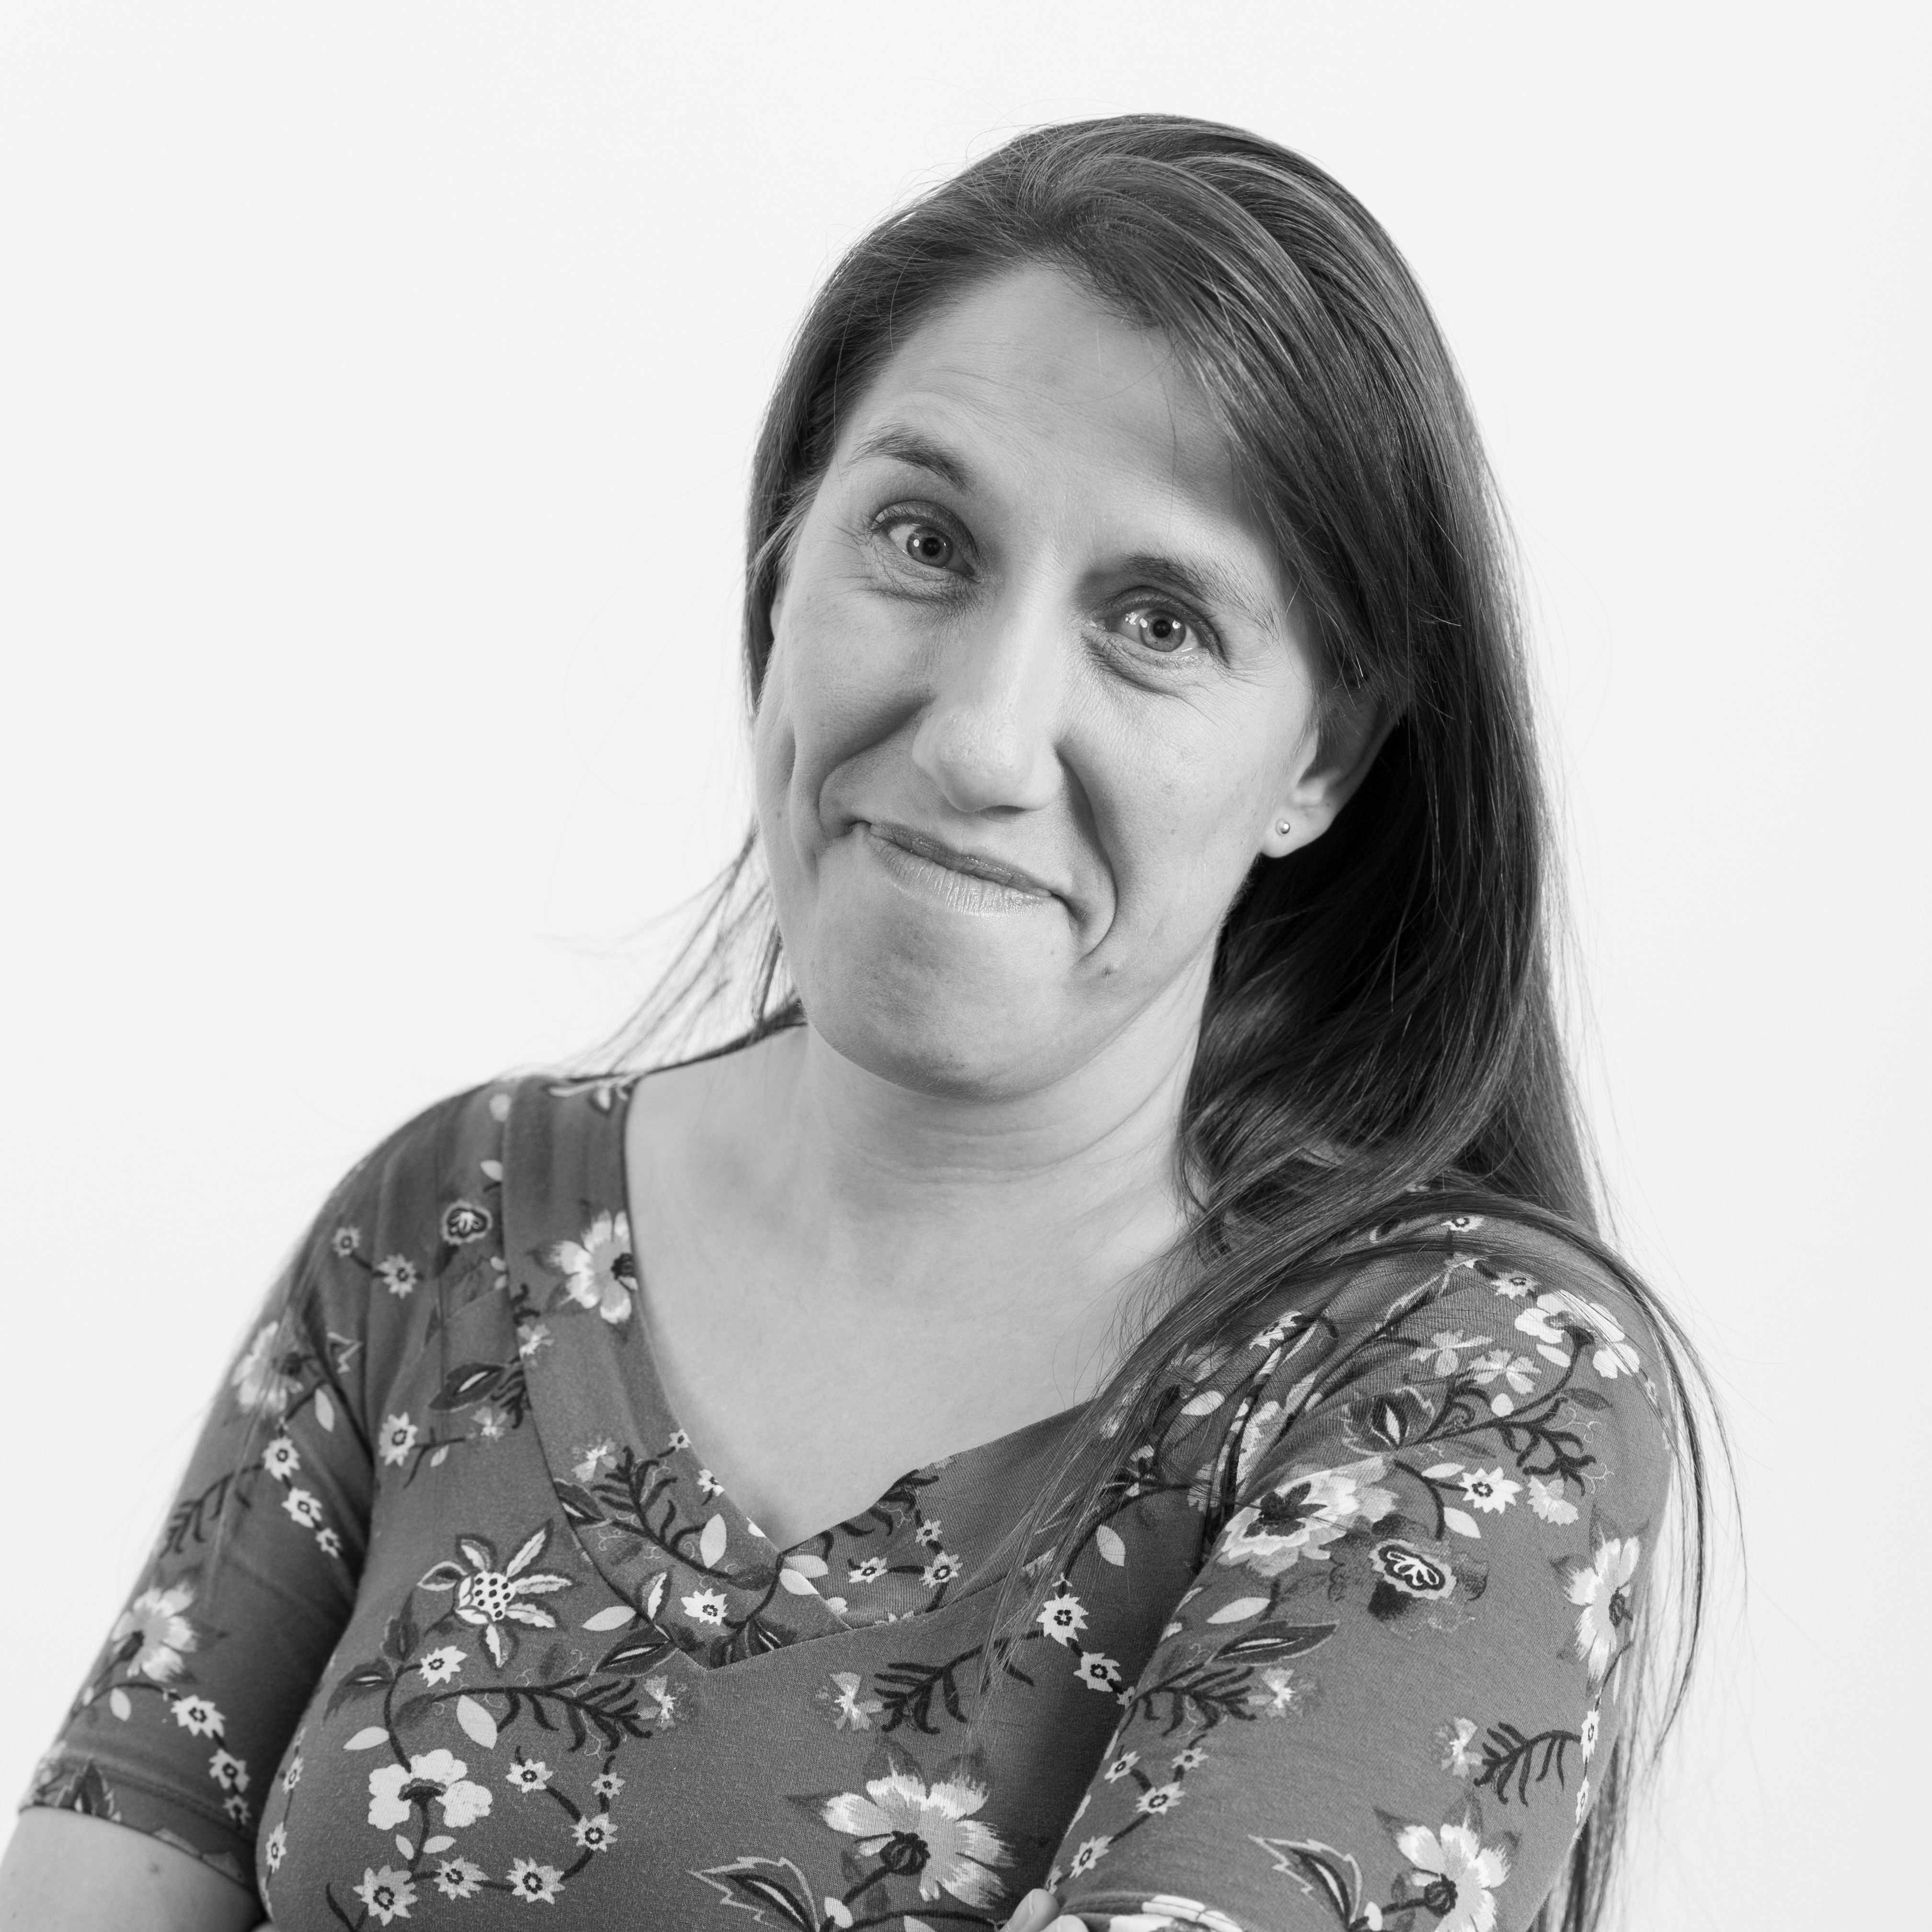 Corinna Köbernick - TEMEDOS® Pysiotherapie Osteopathie  Berlin Charlottenburg